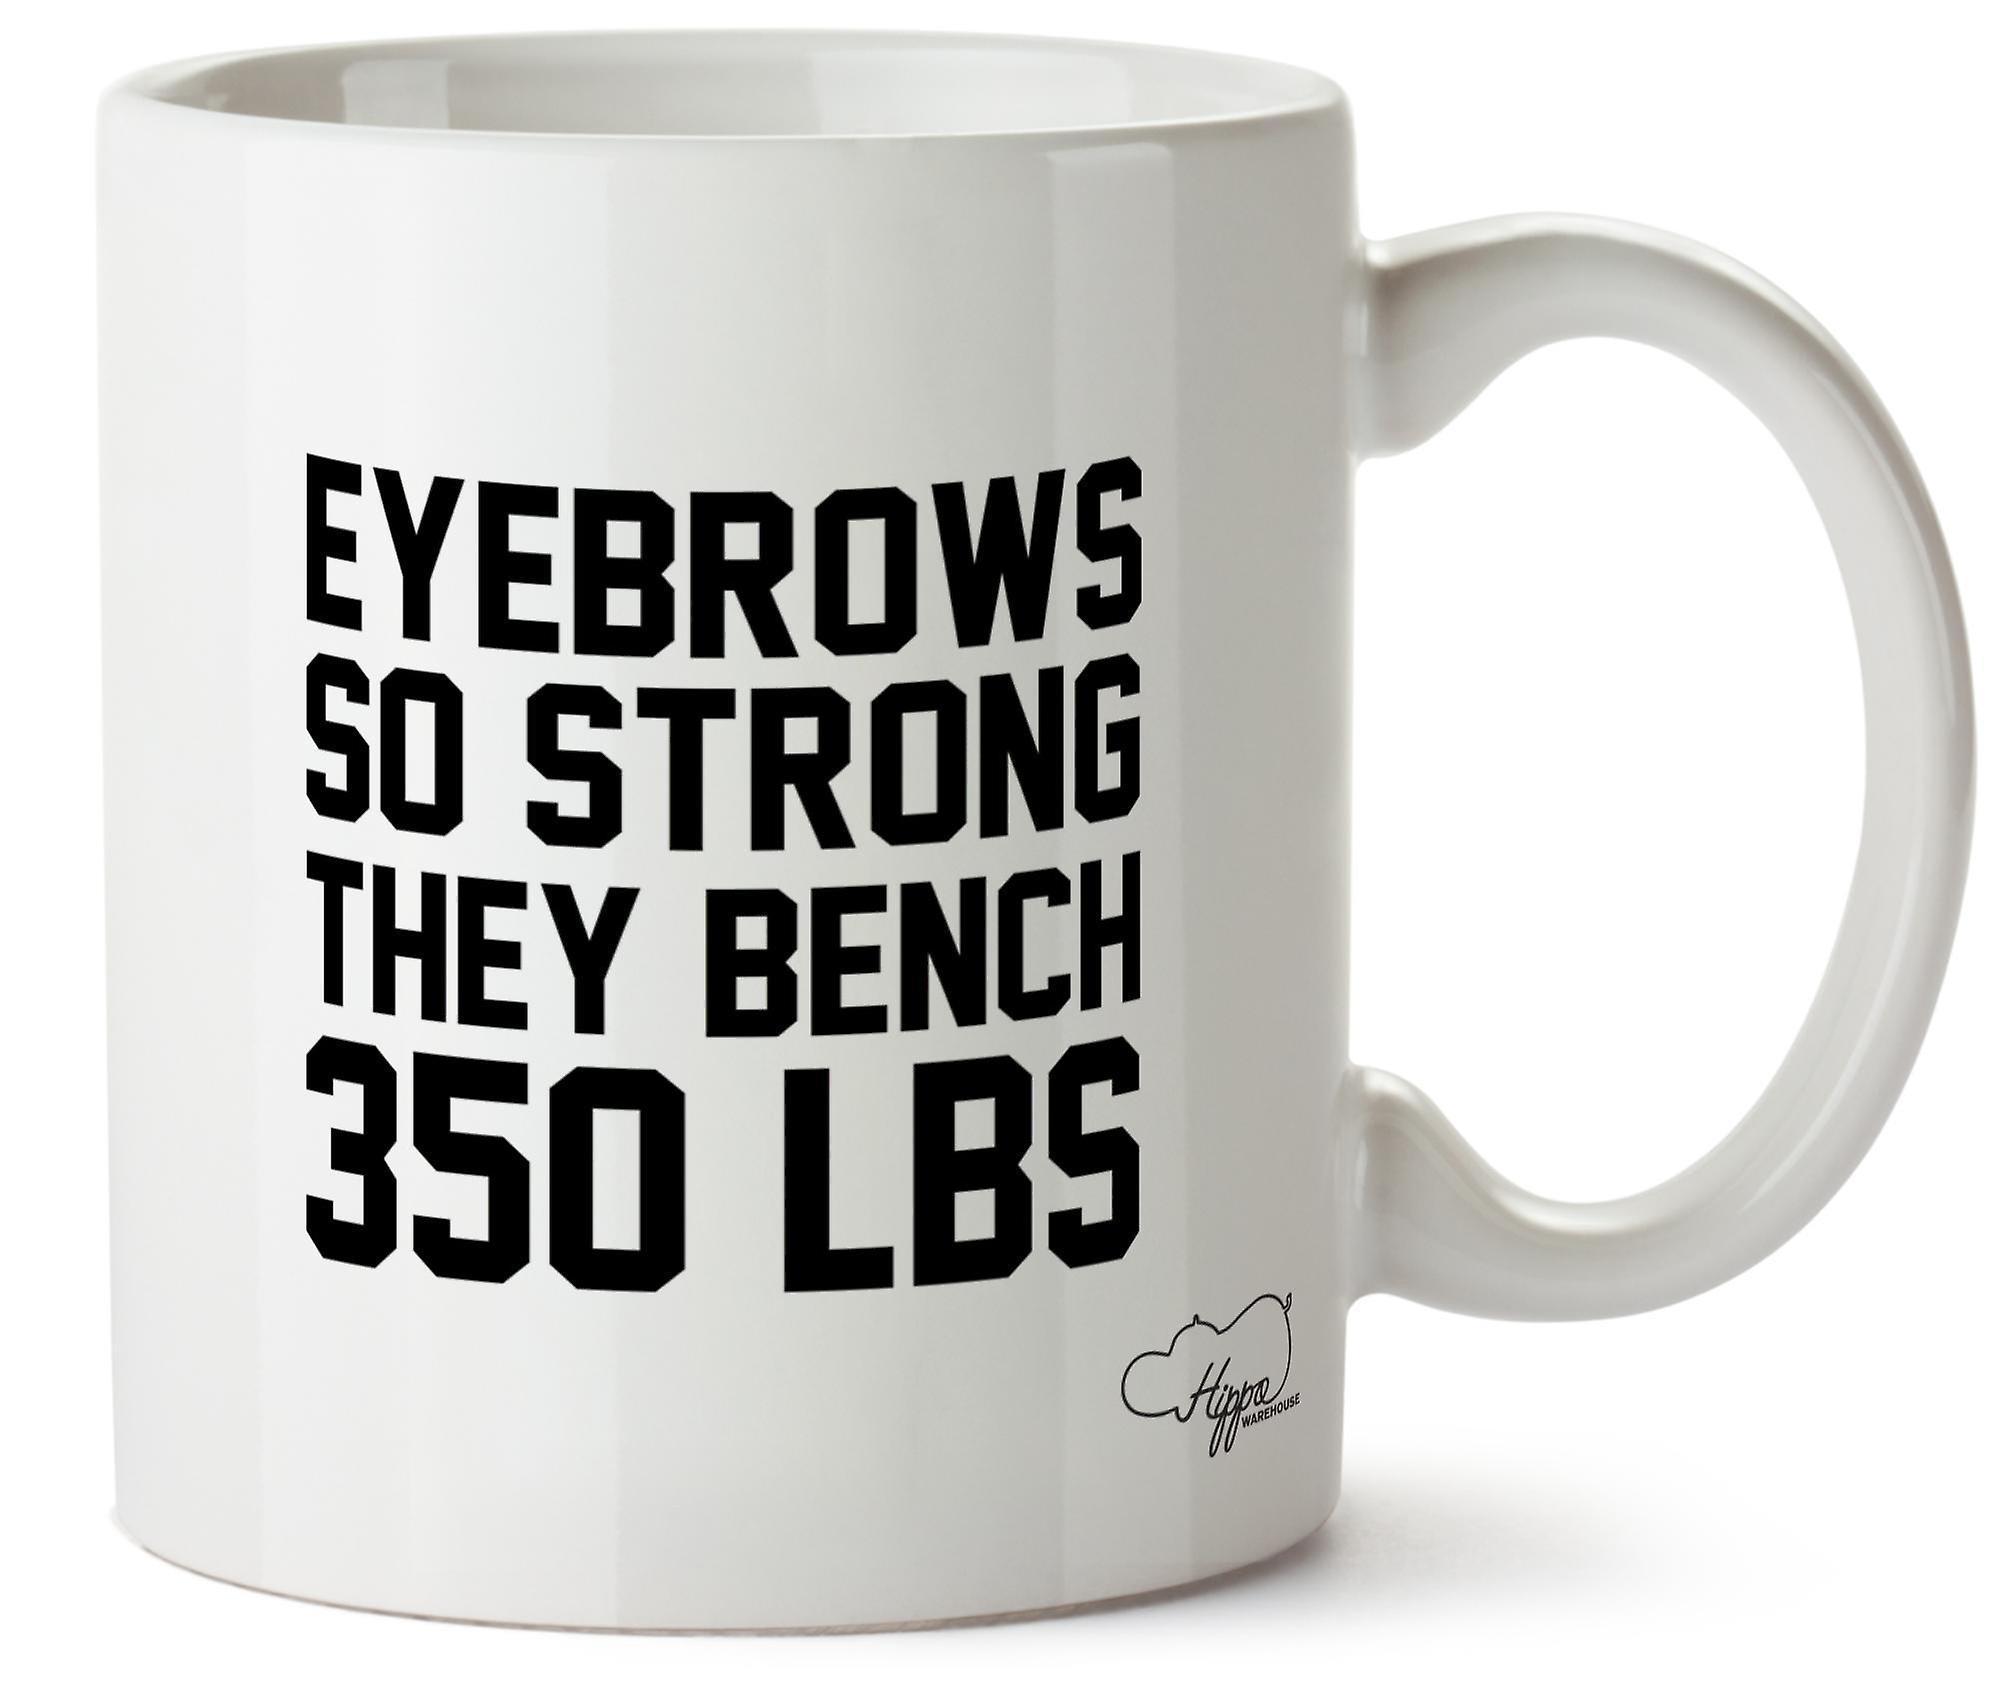 Hippowarehouse Eyebrows So Strong They Bench 350 Lbs Printed Mug Cup Ceramic 10oz